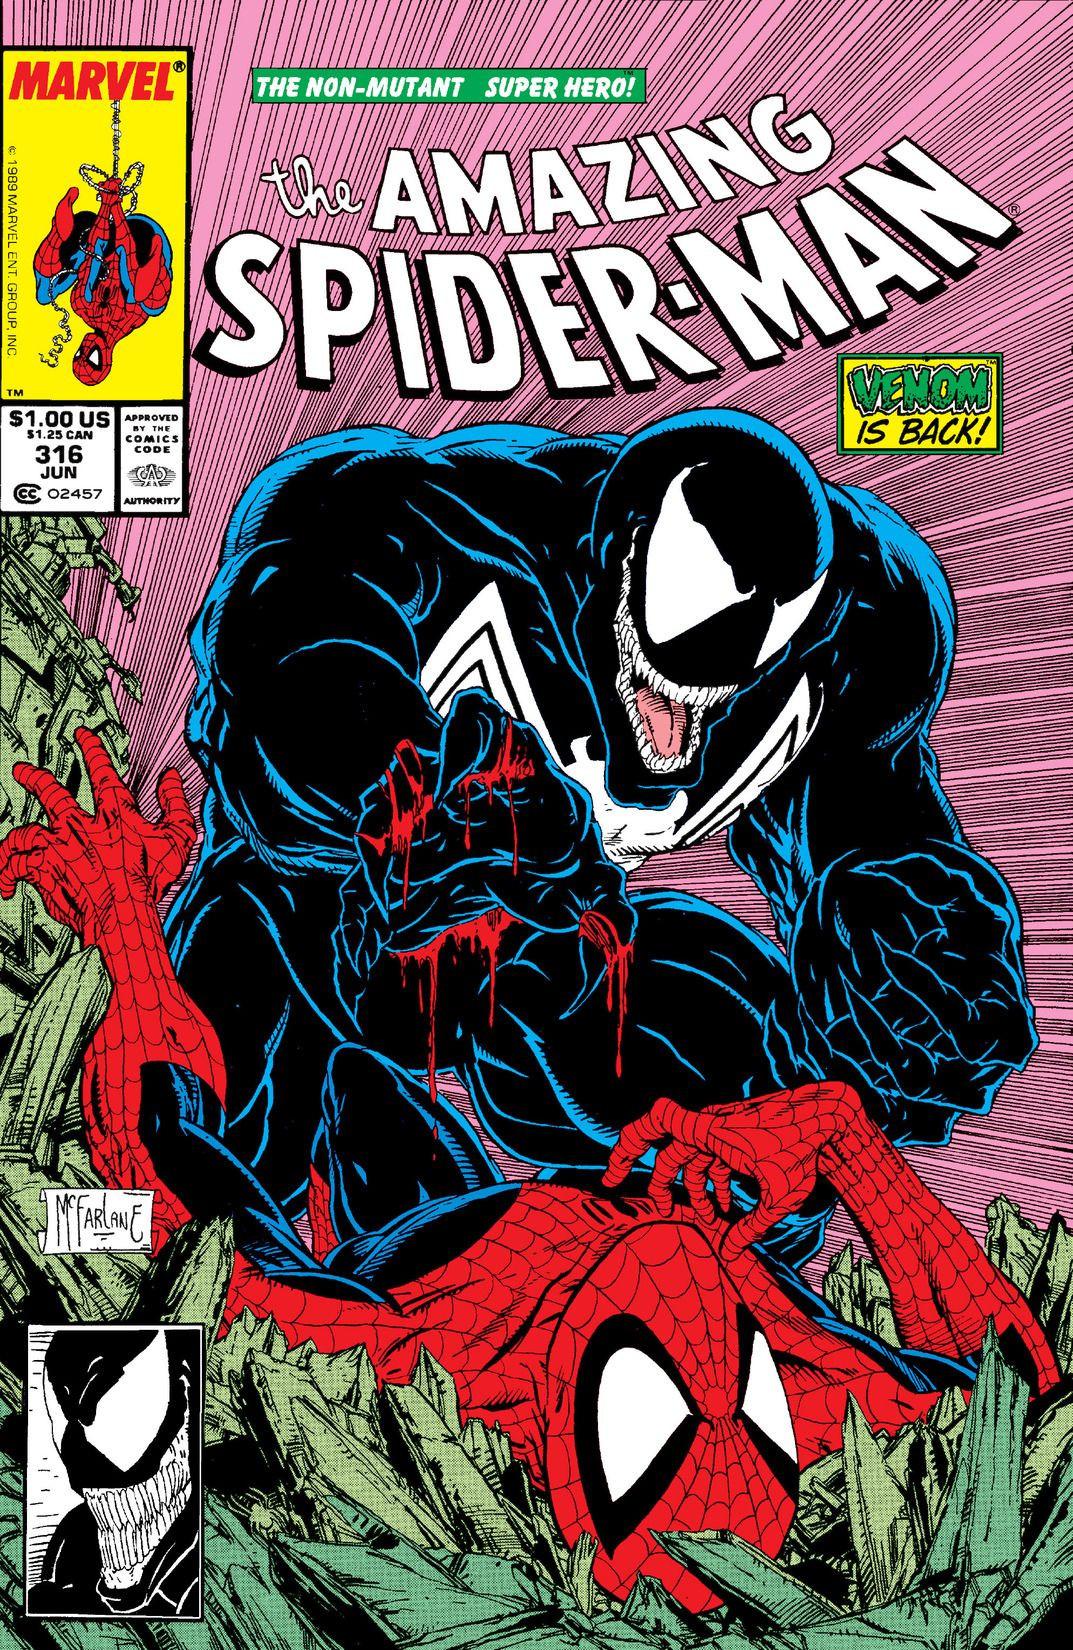 Amazing Spider-Man Vol 1 316 - Marvel Comics Database The Amazing Spider Man 3 Black Cat